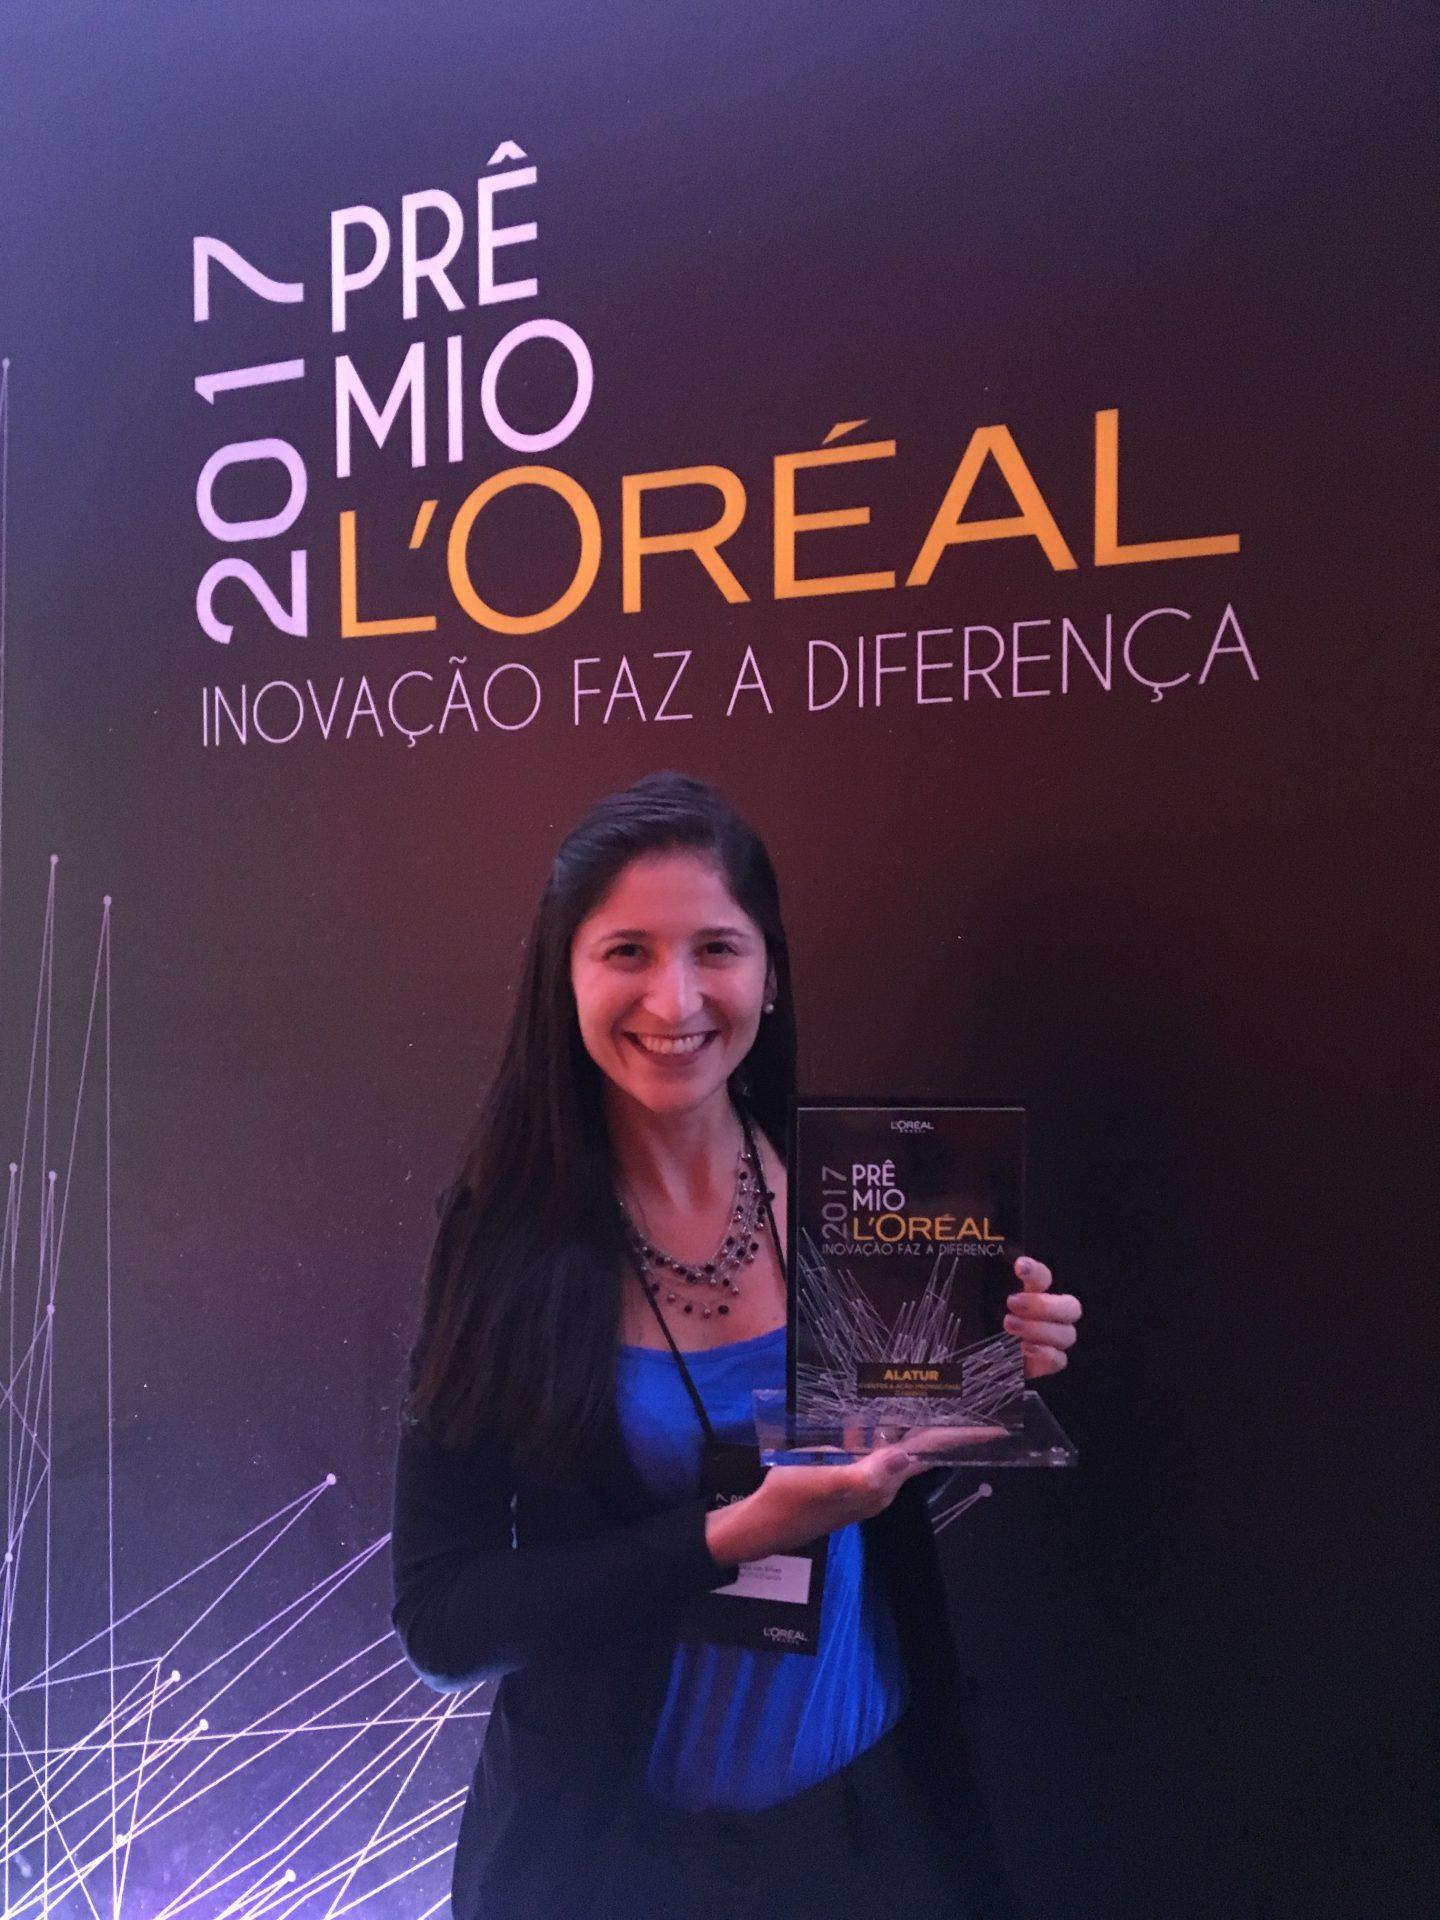 Beatriz Van Erven, gerente de eventos da Alatur JTB, recebe o Prêmo L'Oréal 2017